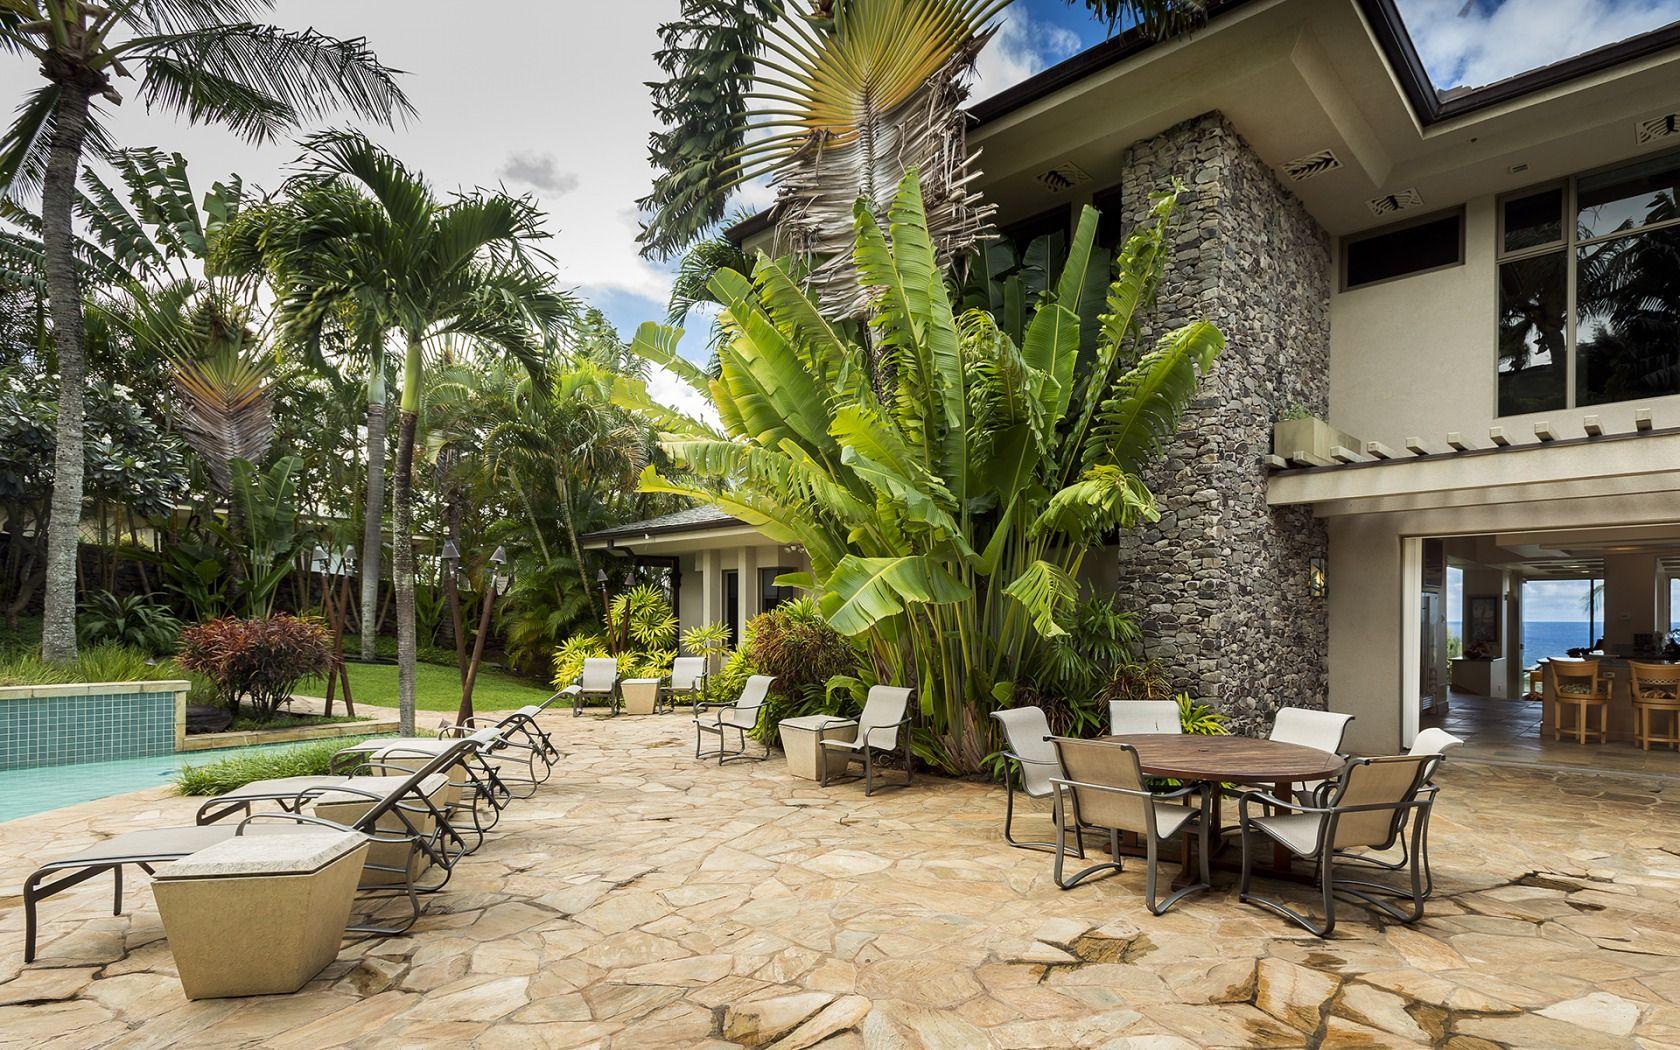 Maui, Hawaii, luxury, home, garden, palm, pool